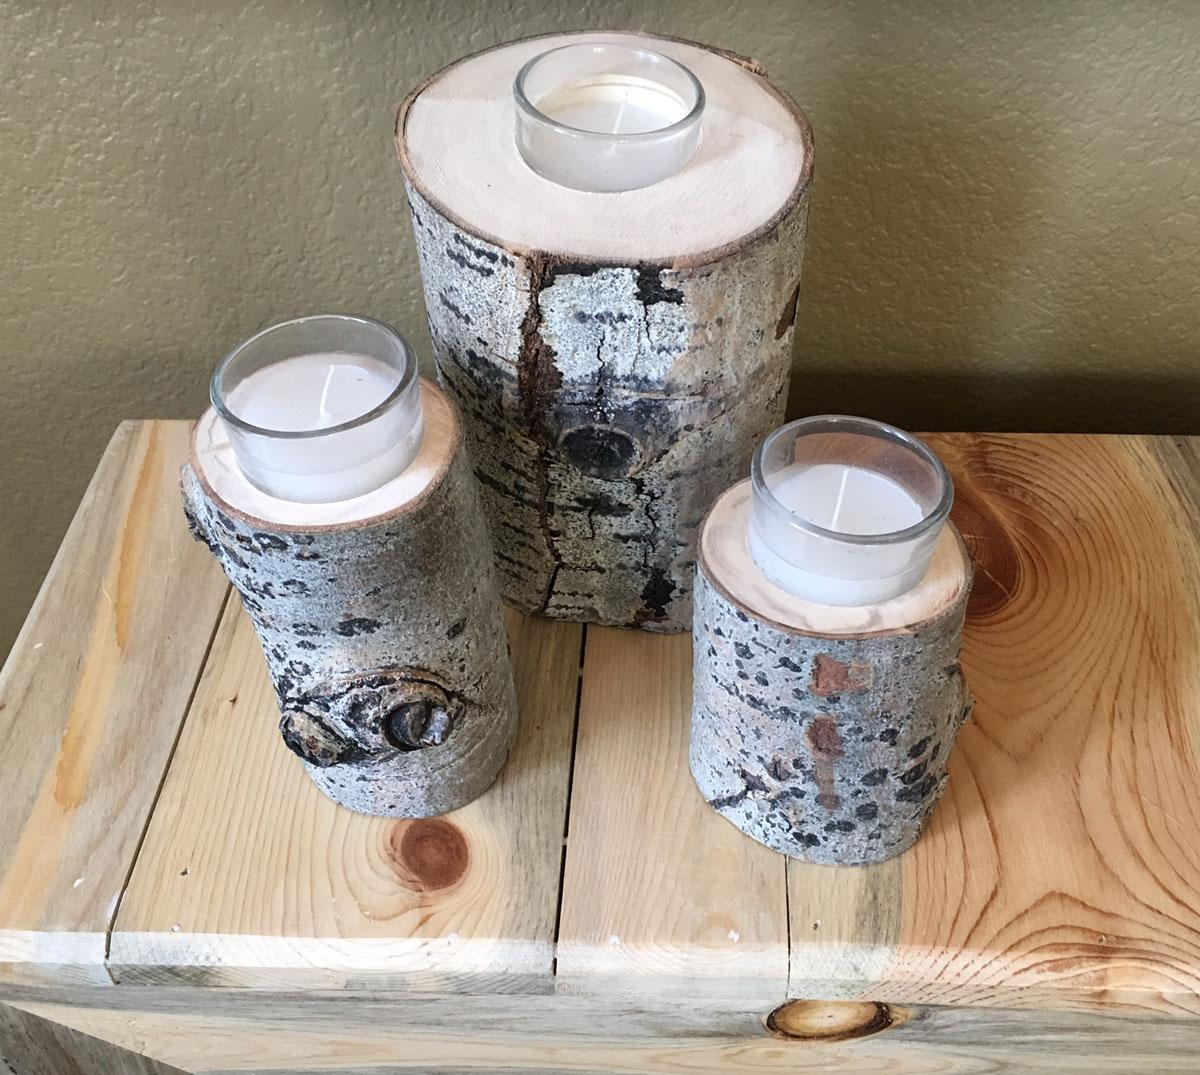 Aspen candle holder $12